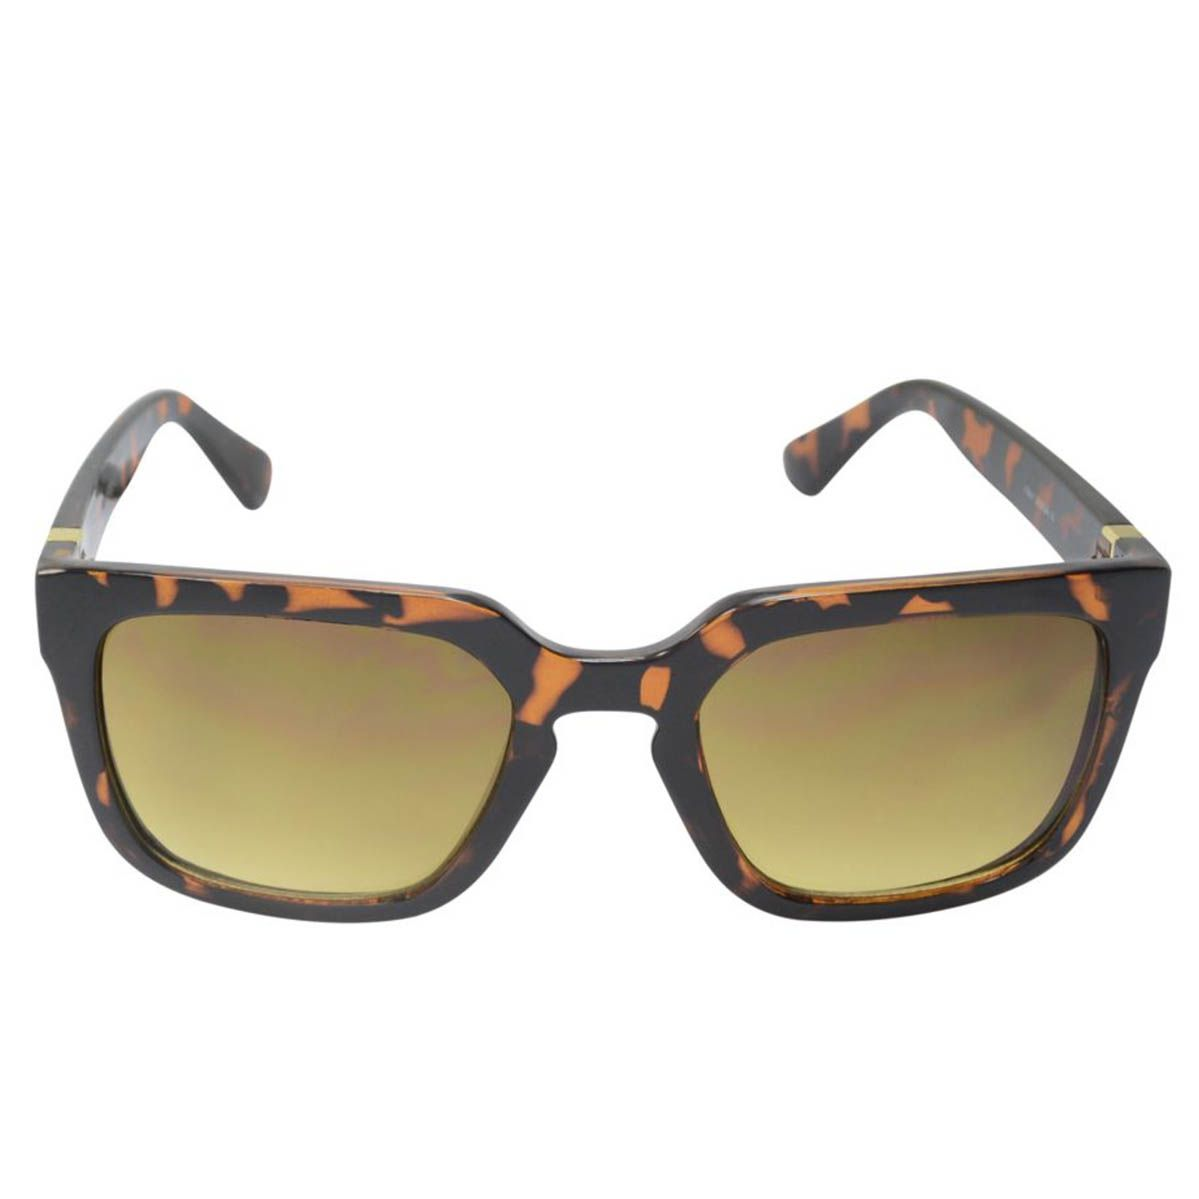 Óculos de Sol Mackage Feminino AMK15066-3 Animal Print Marrom